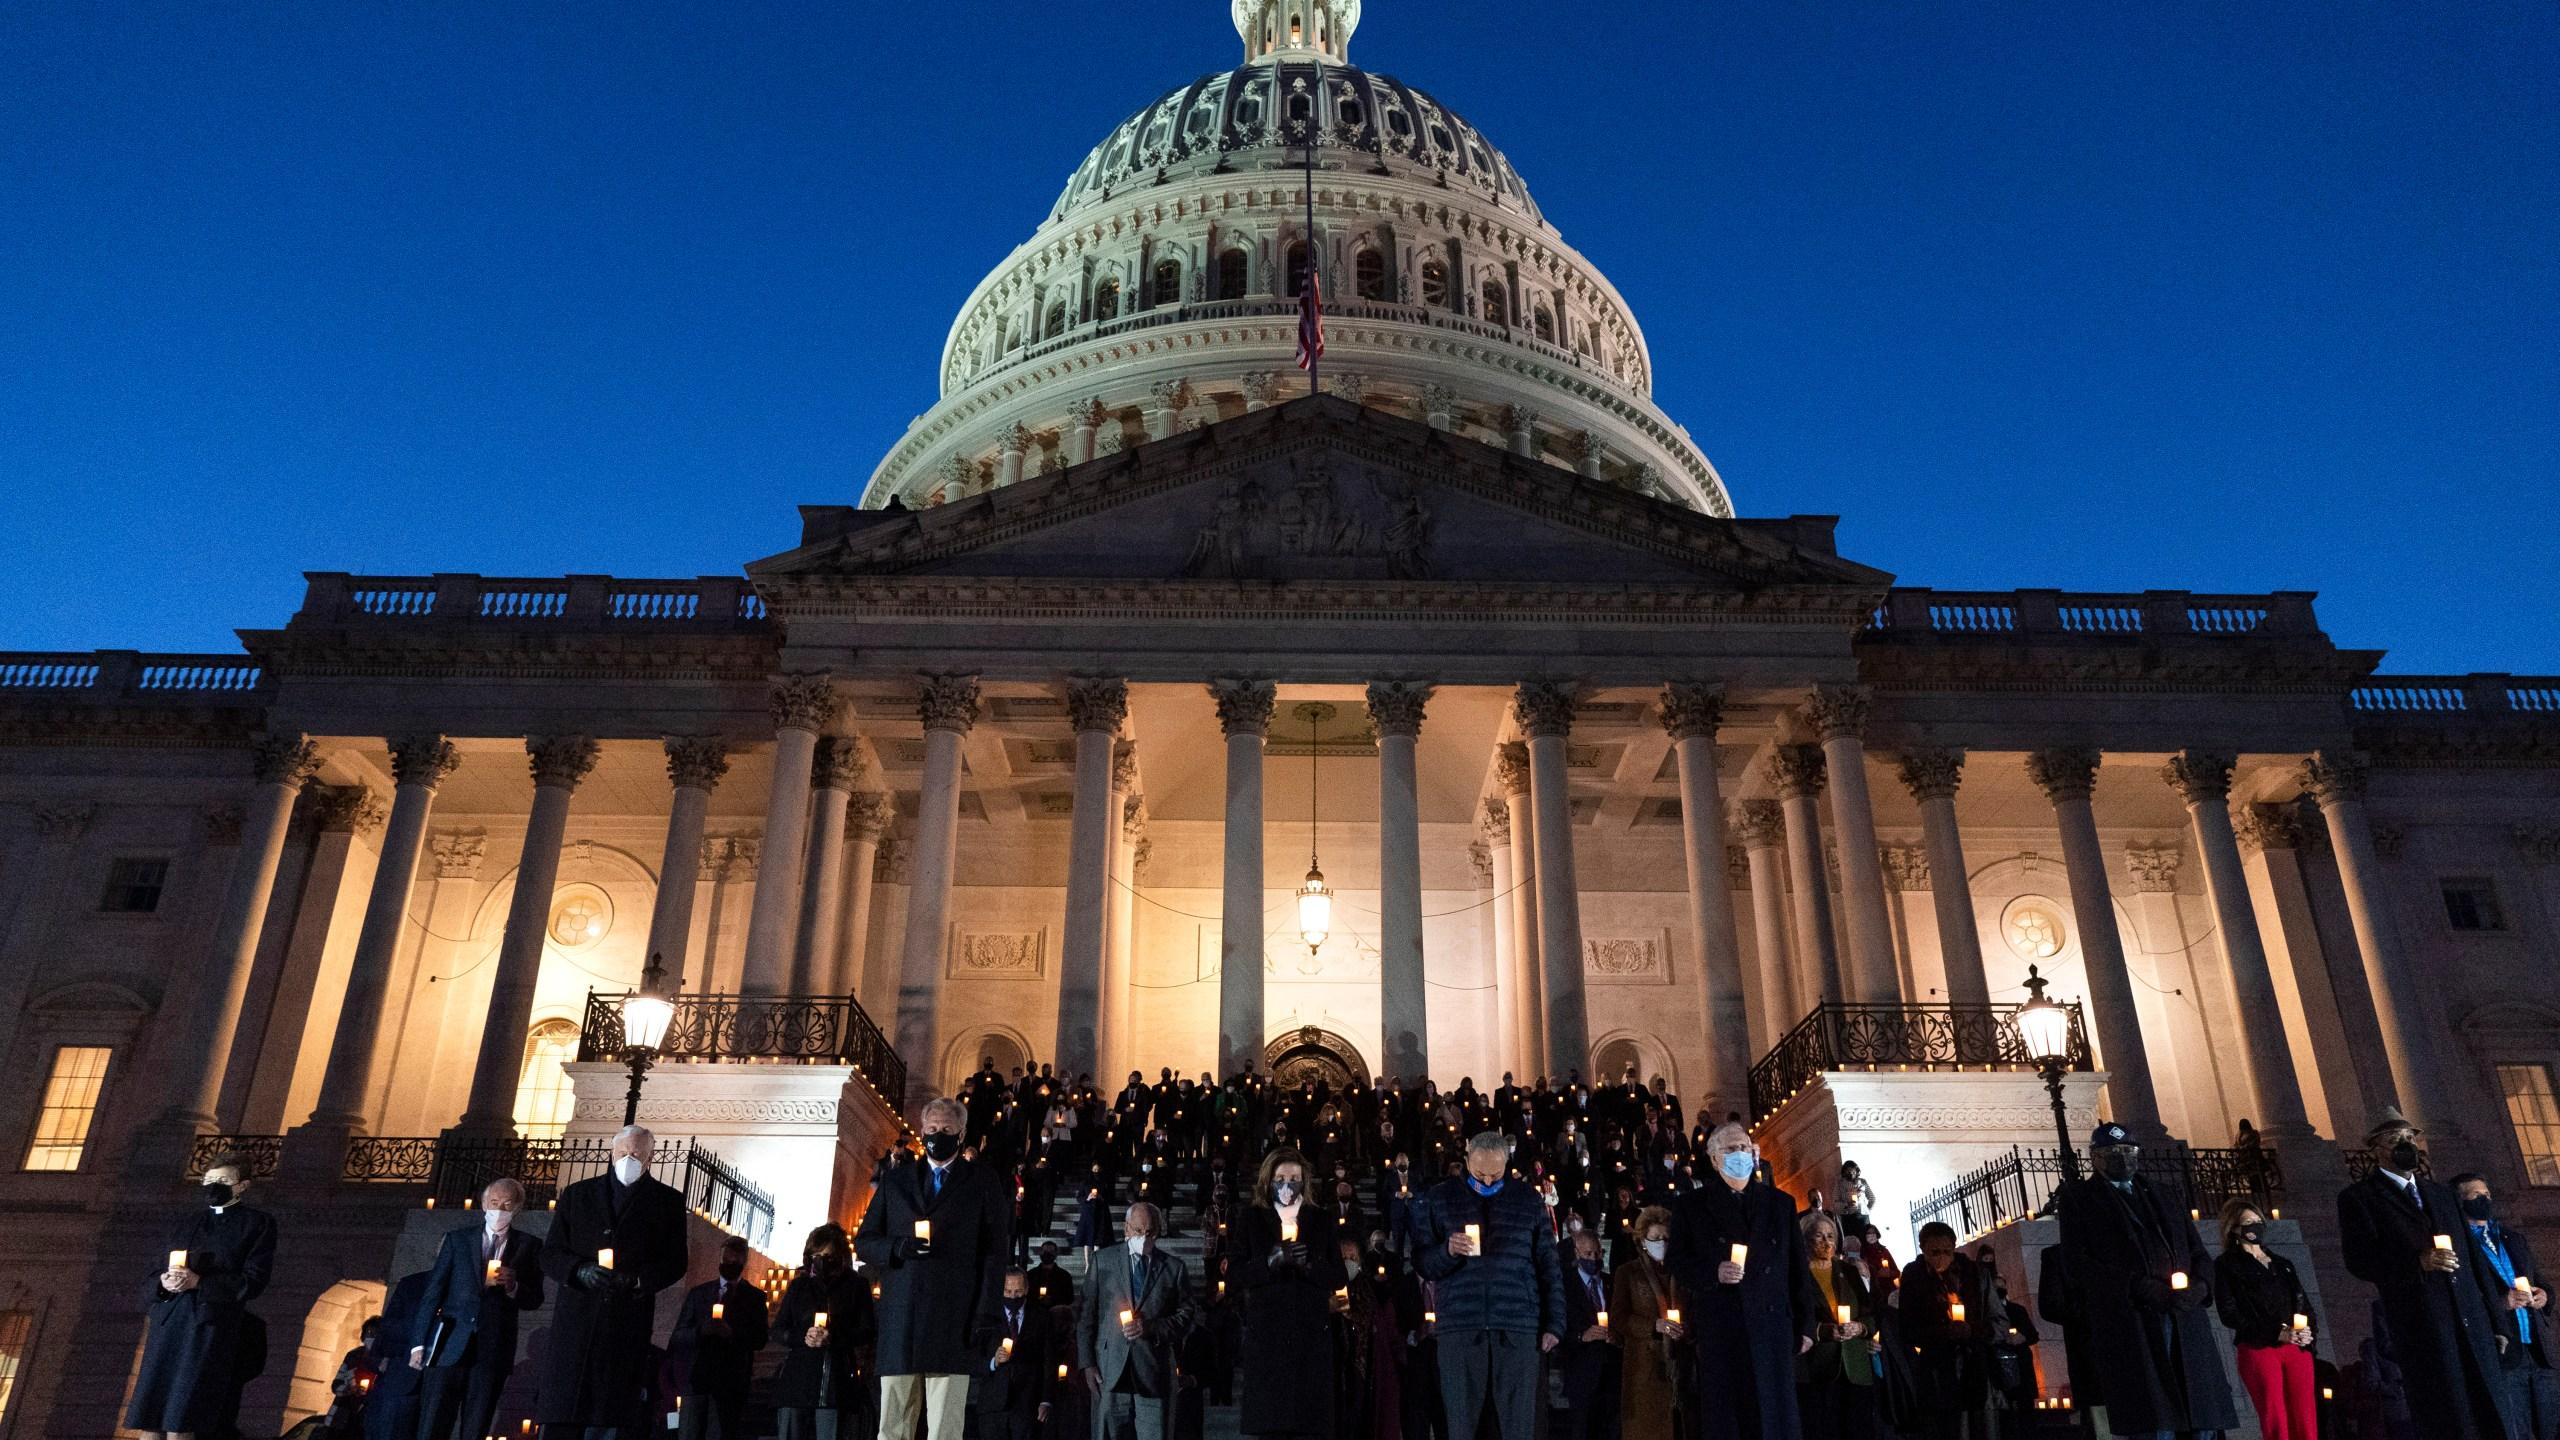 Nancy Pelosi, Mitch McConnell, Chuck Schumer, Kevin McCarthy